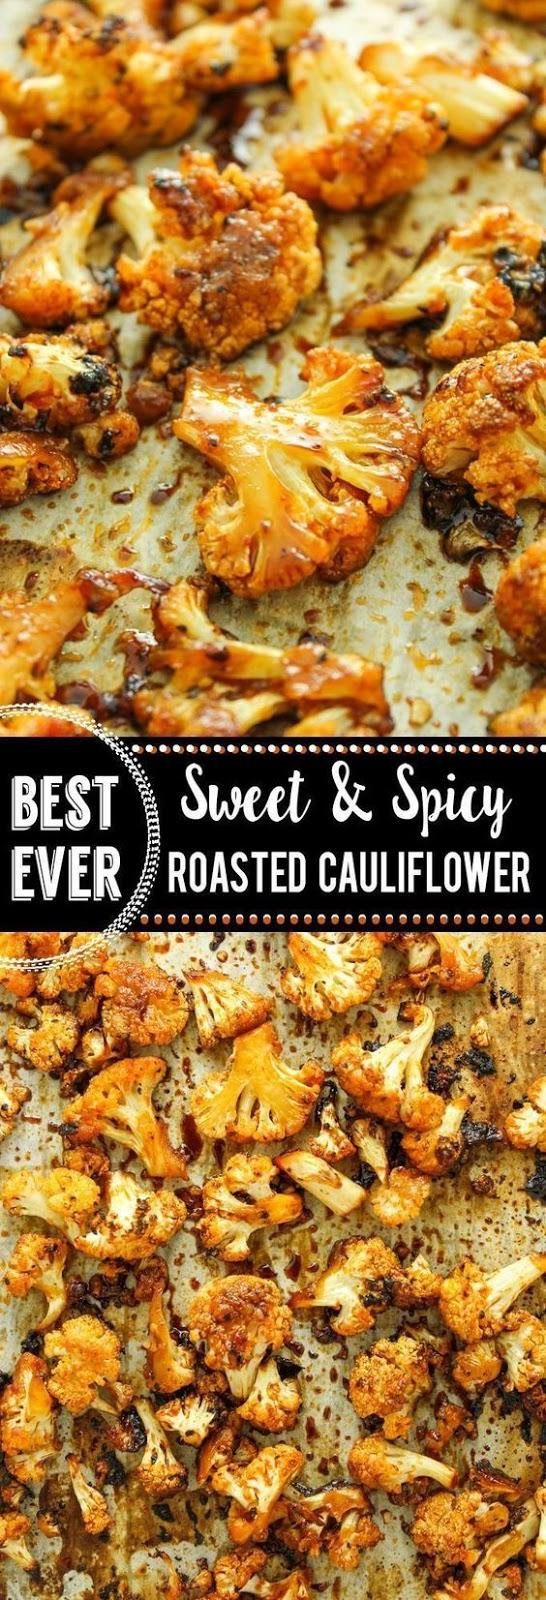 Sweet and Spícy Baked Caulíflower